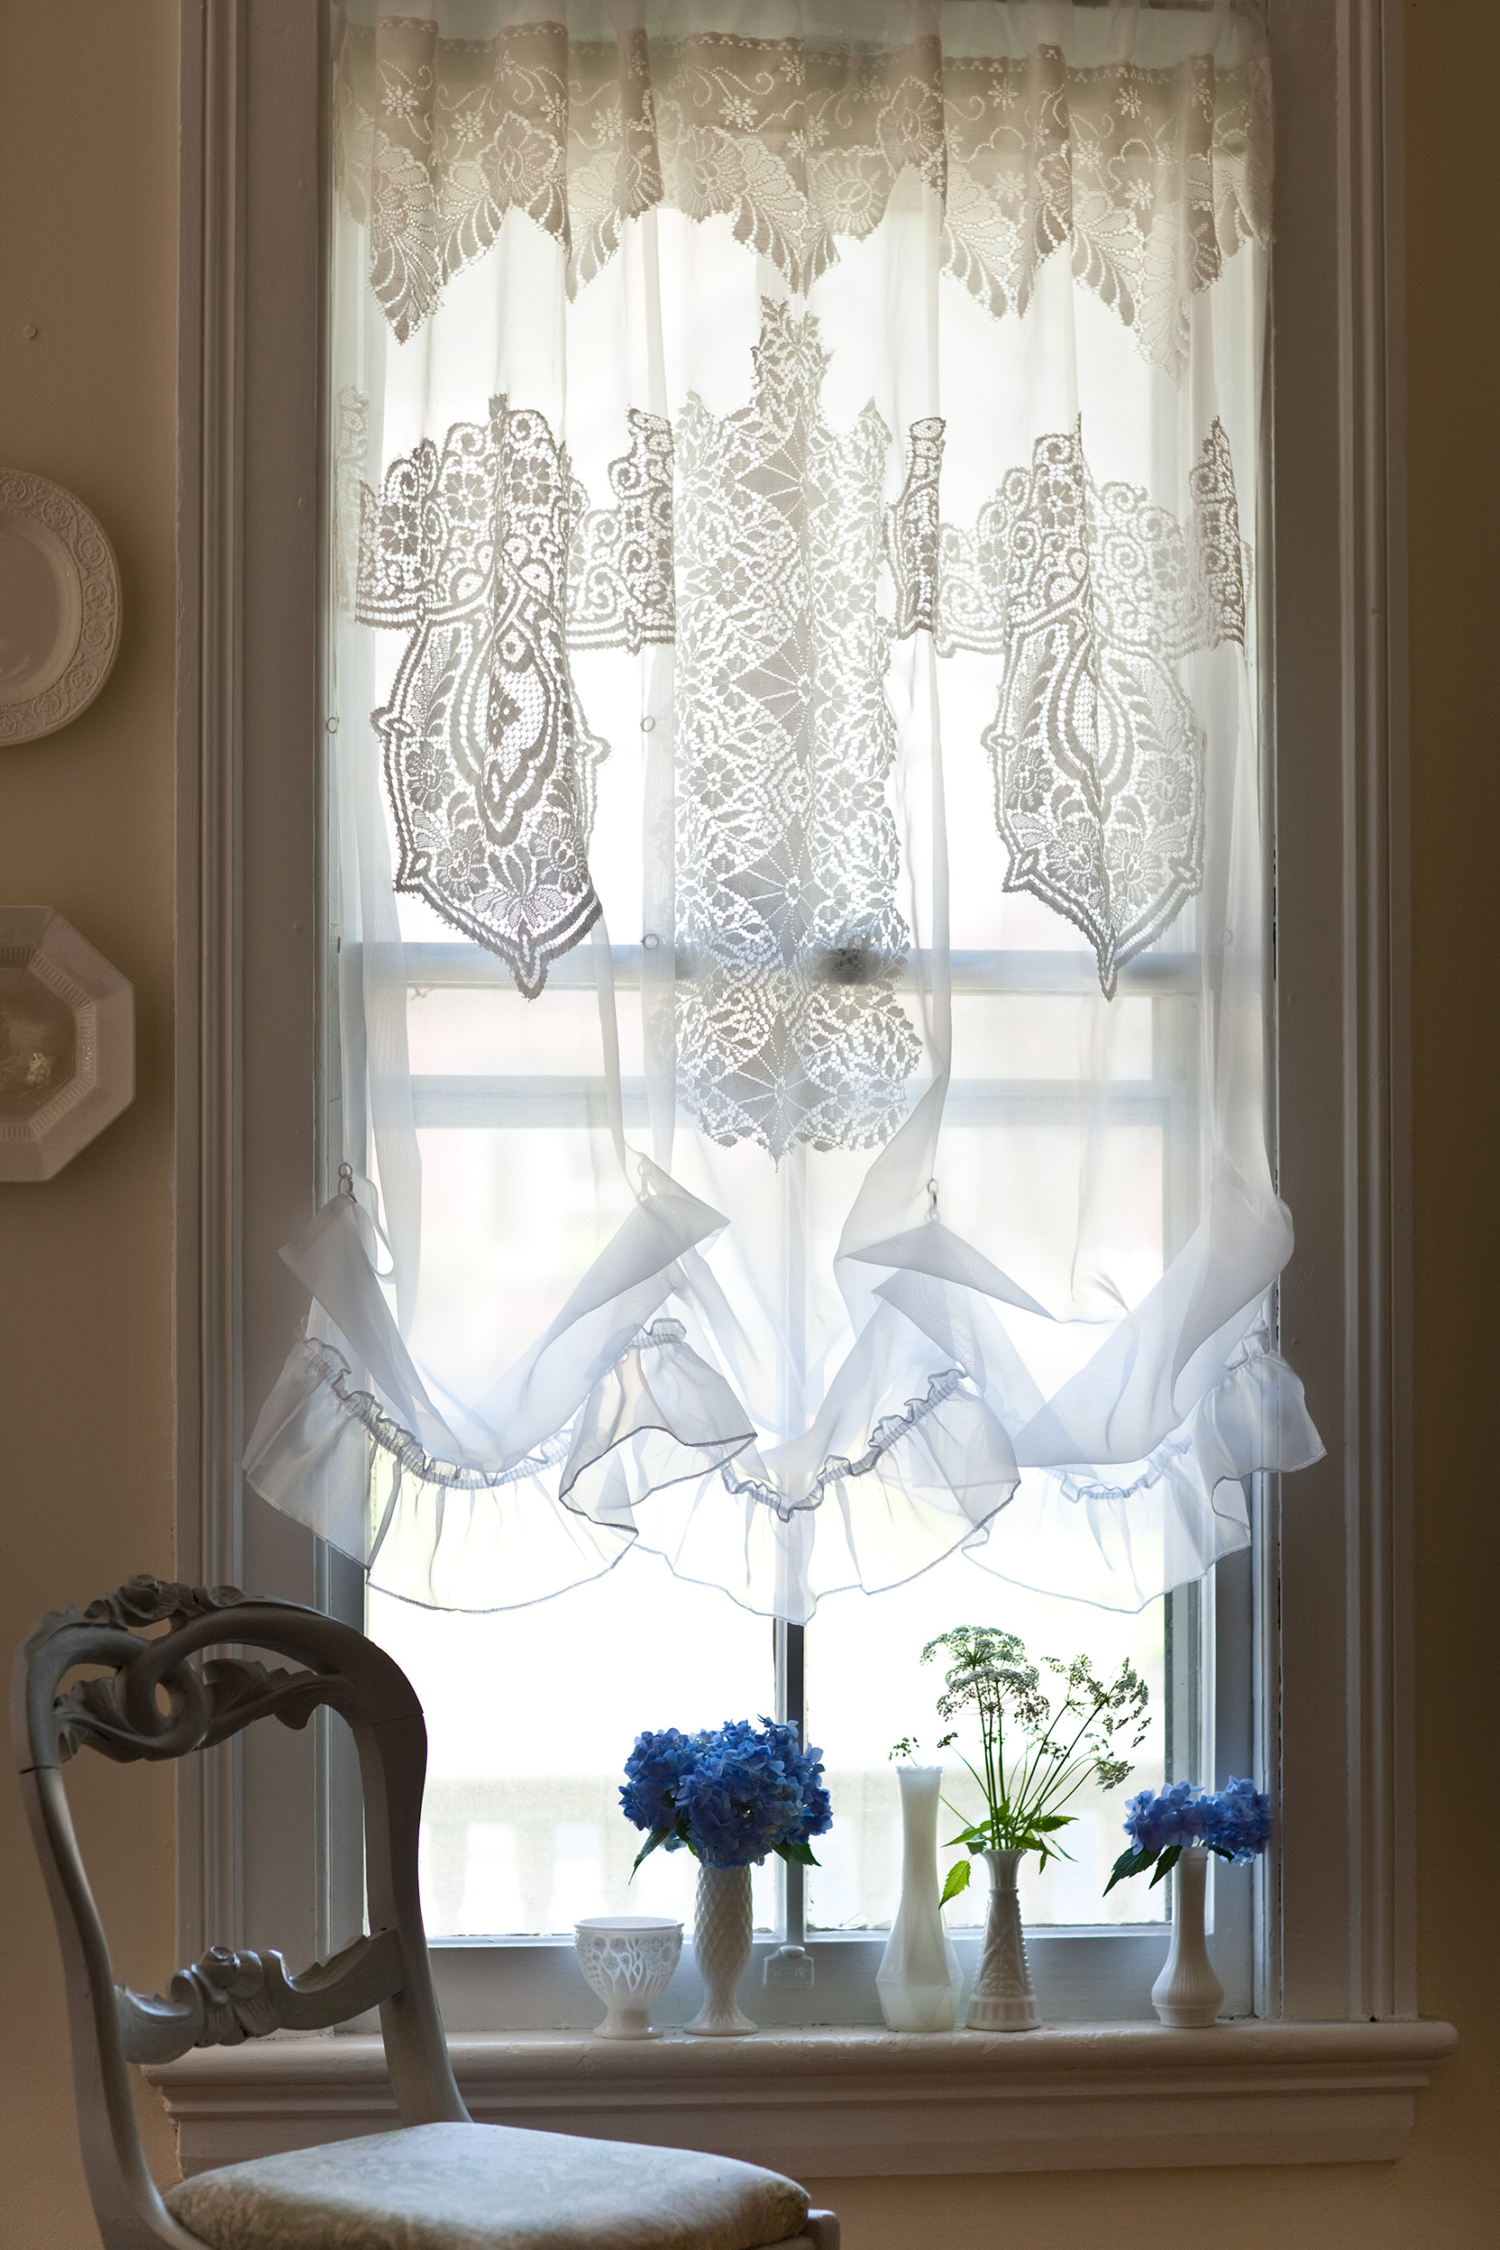 Rustic Window Treatment Ideas   Better Homes & Gardens on Farmhouse Curtain Ideas  id=67507